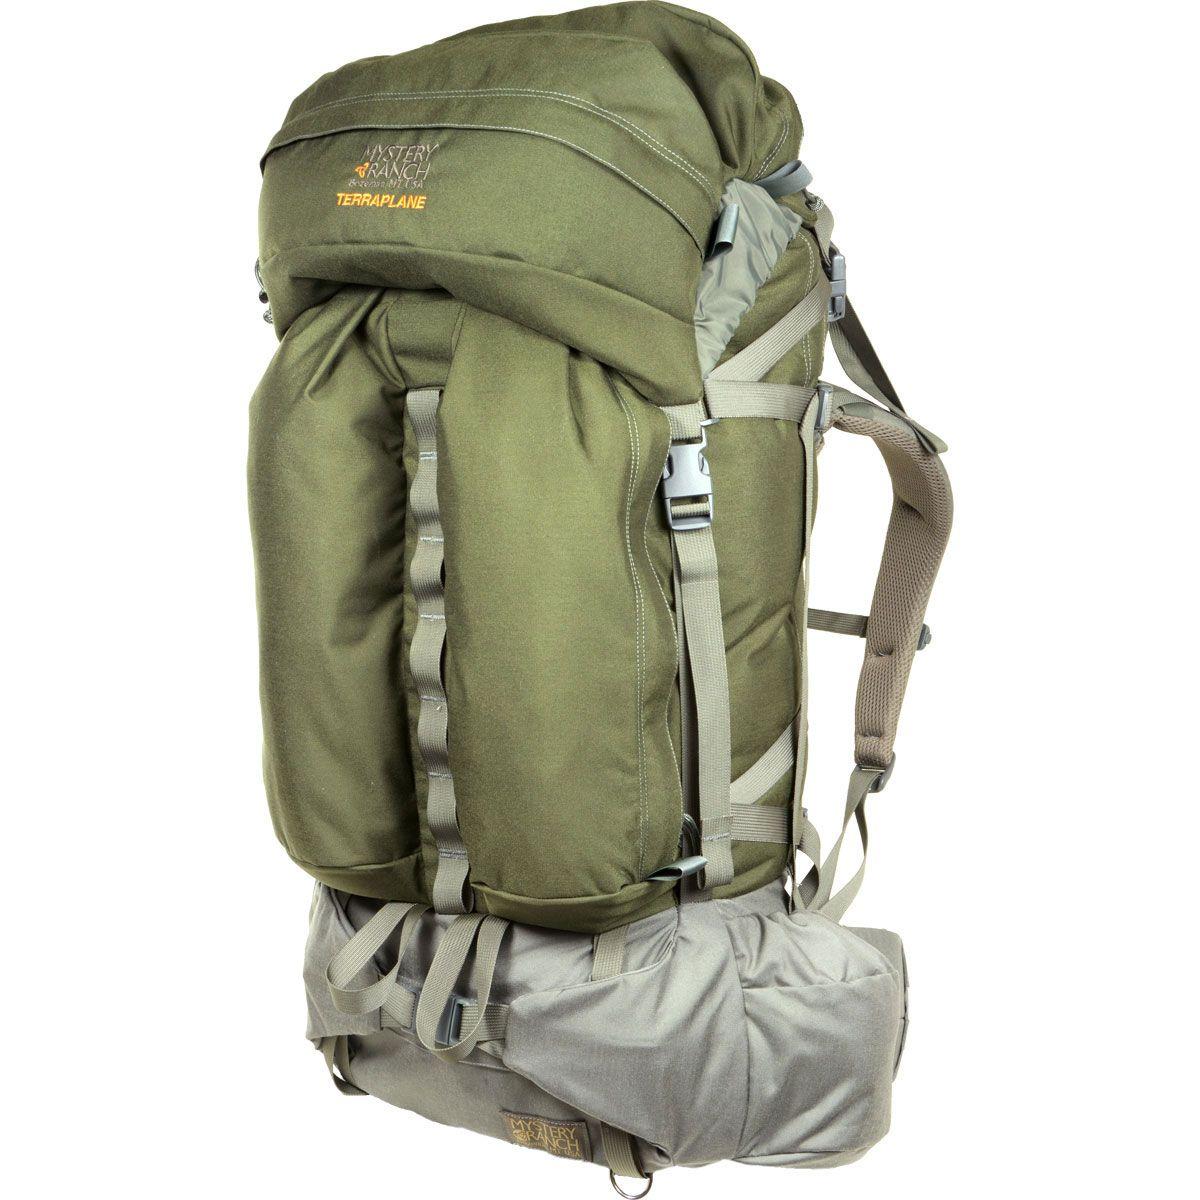 Terraplane Pack   Mystery Ranch Backpacks